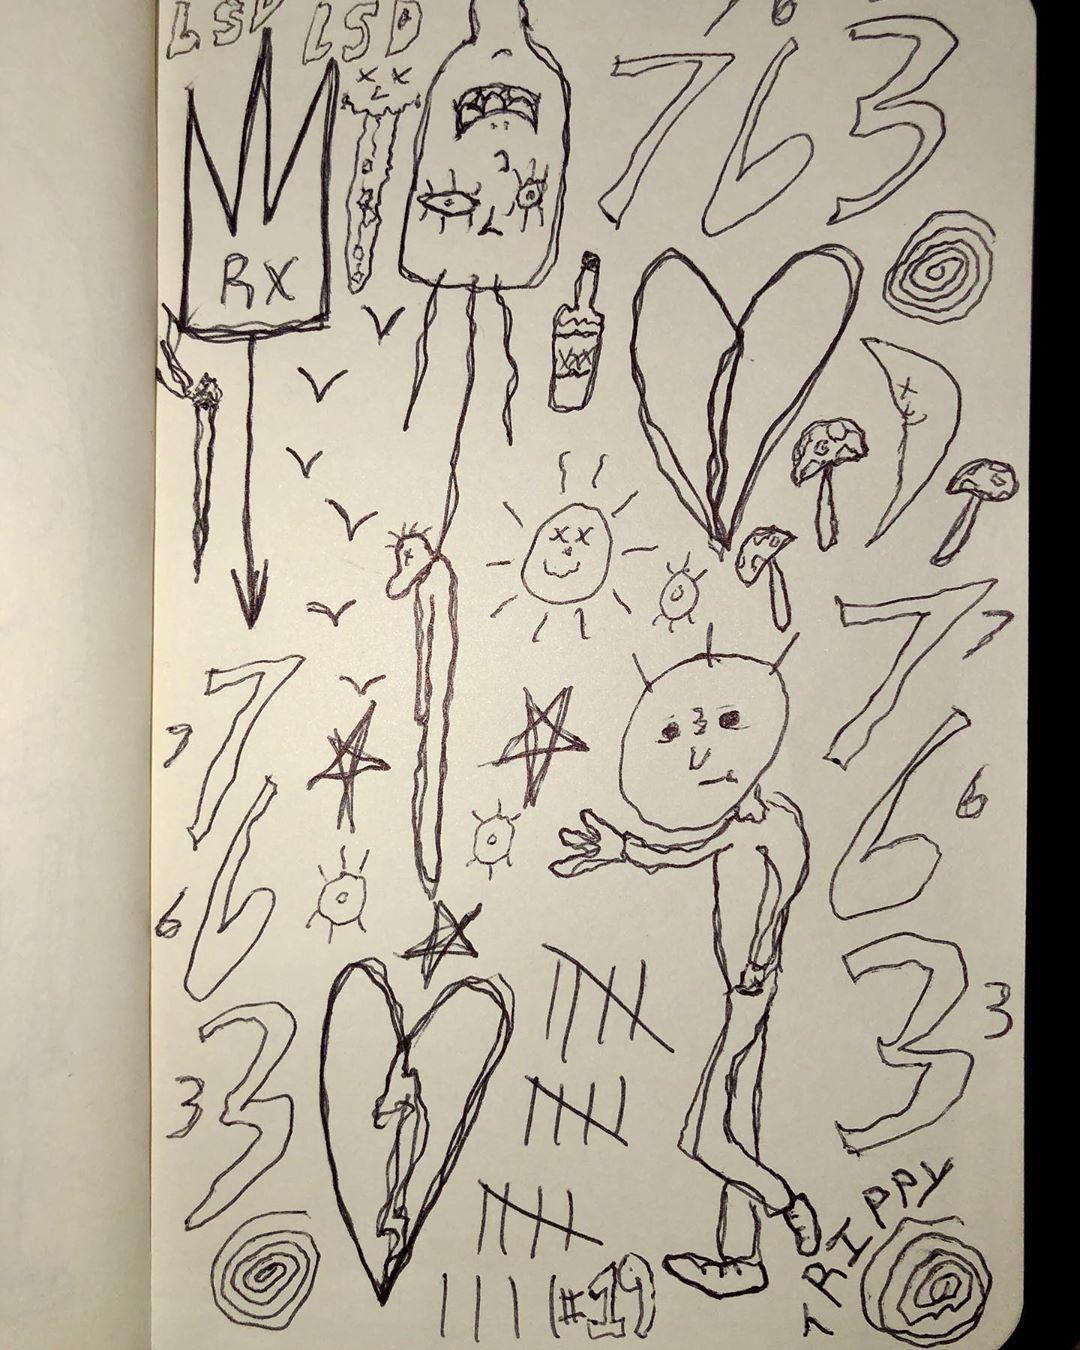 """SketchyScene""     #art #artist #strangeart #weirdart #sketch #sketchbook #instaart #lowbro #offensiveart #lowbrowart #grungeart #grungeartist #instaart #grungesketch #uniqueart #7 #763 #emotionalart #oddart #definedart #mindart #ohioartist #americanartist #rejected #explorepage"